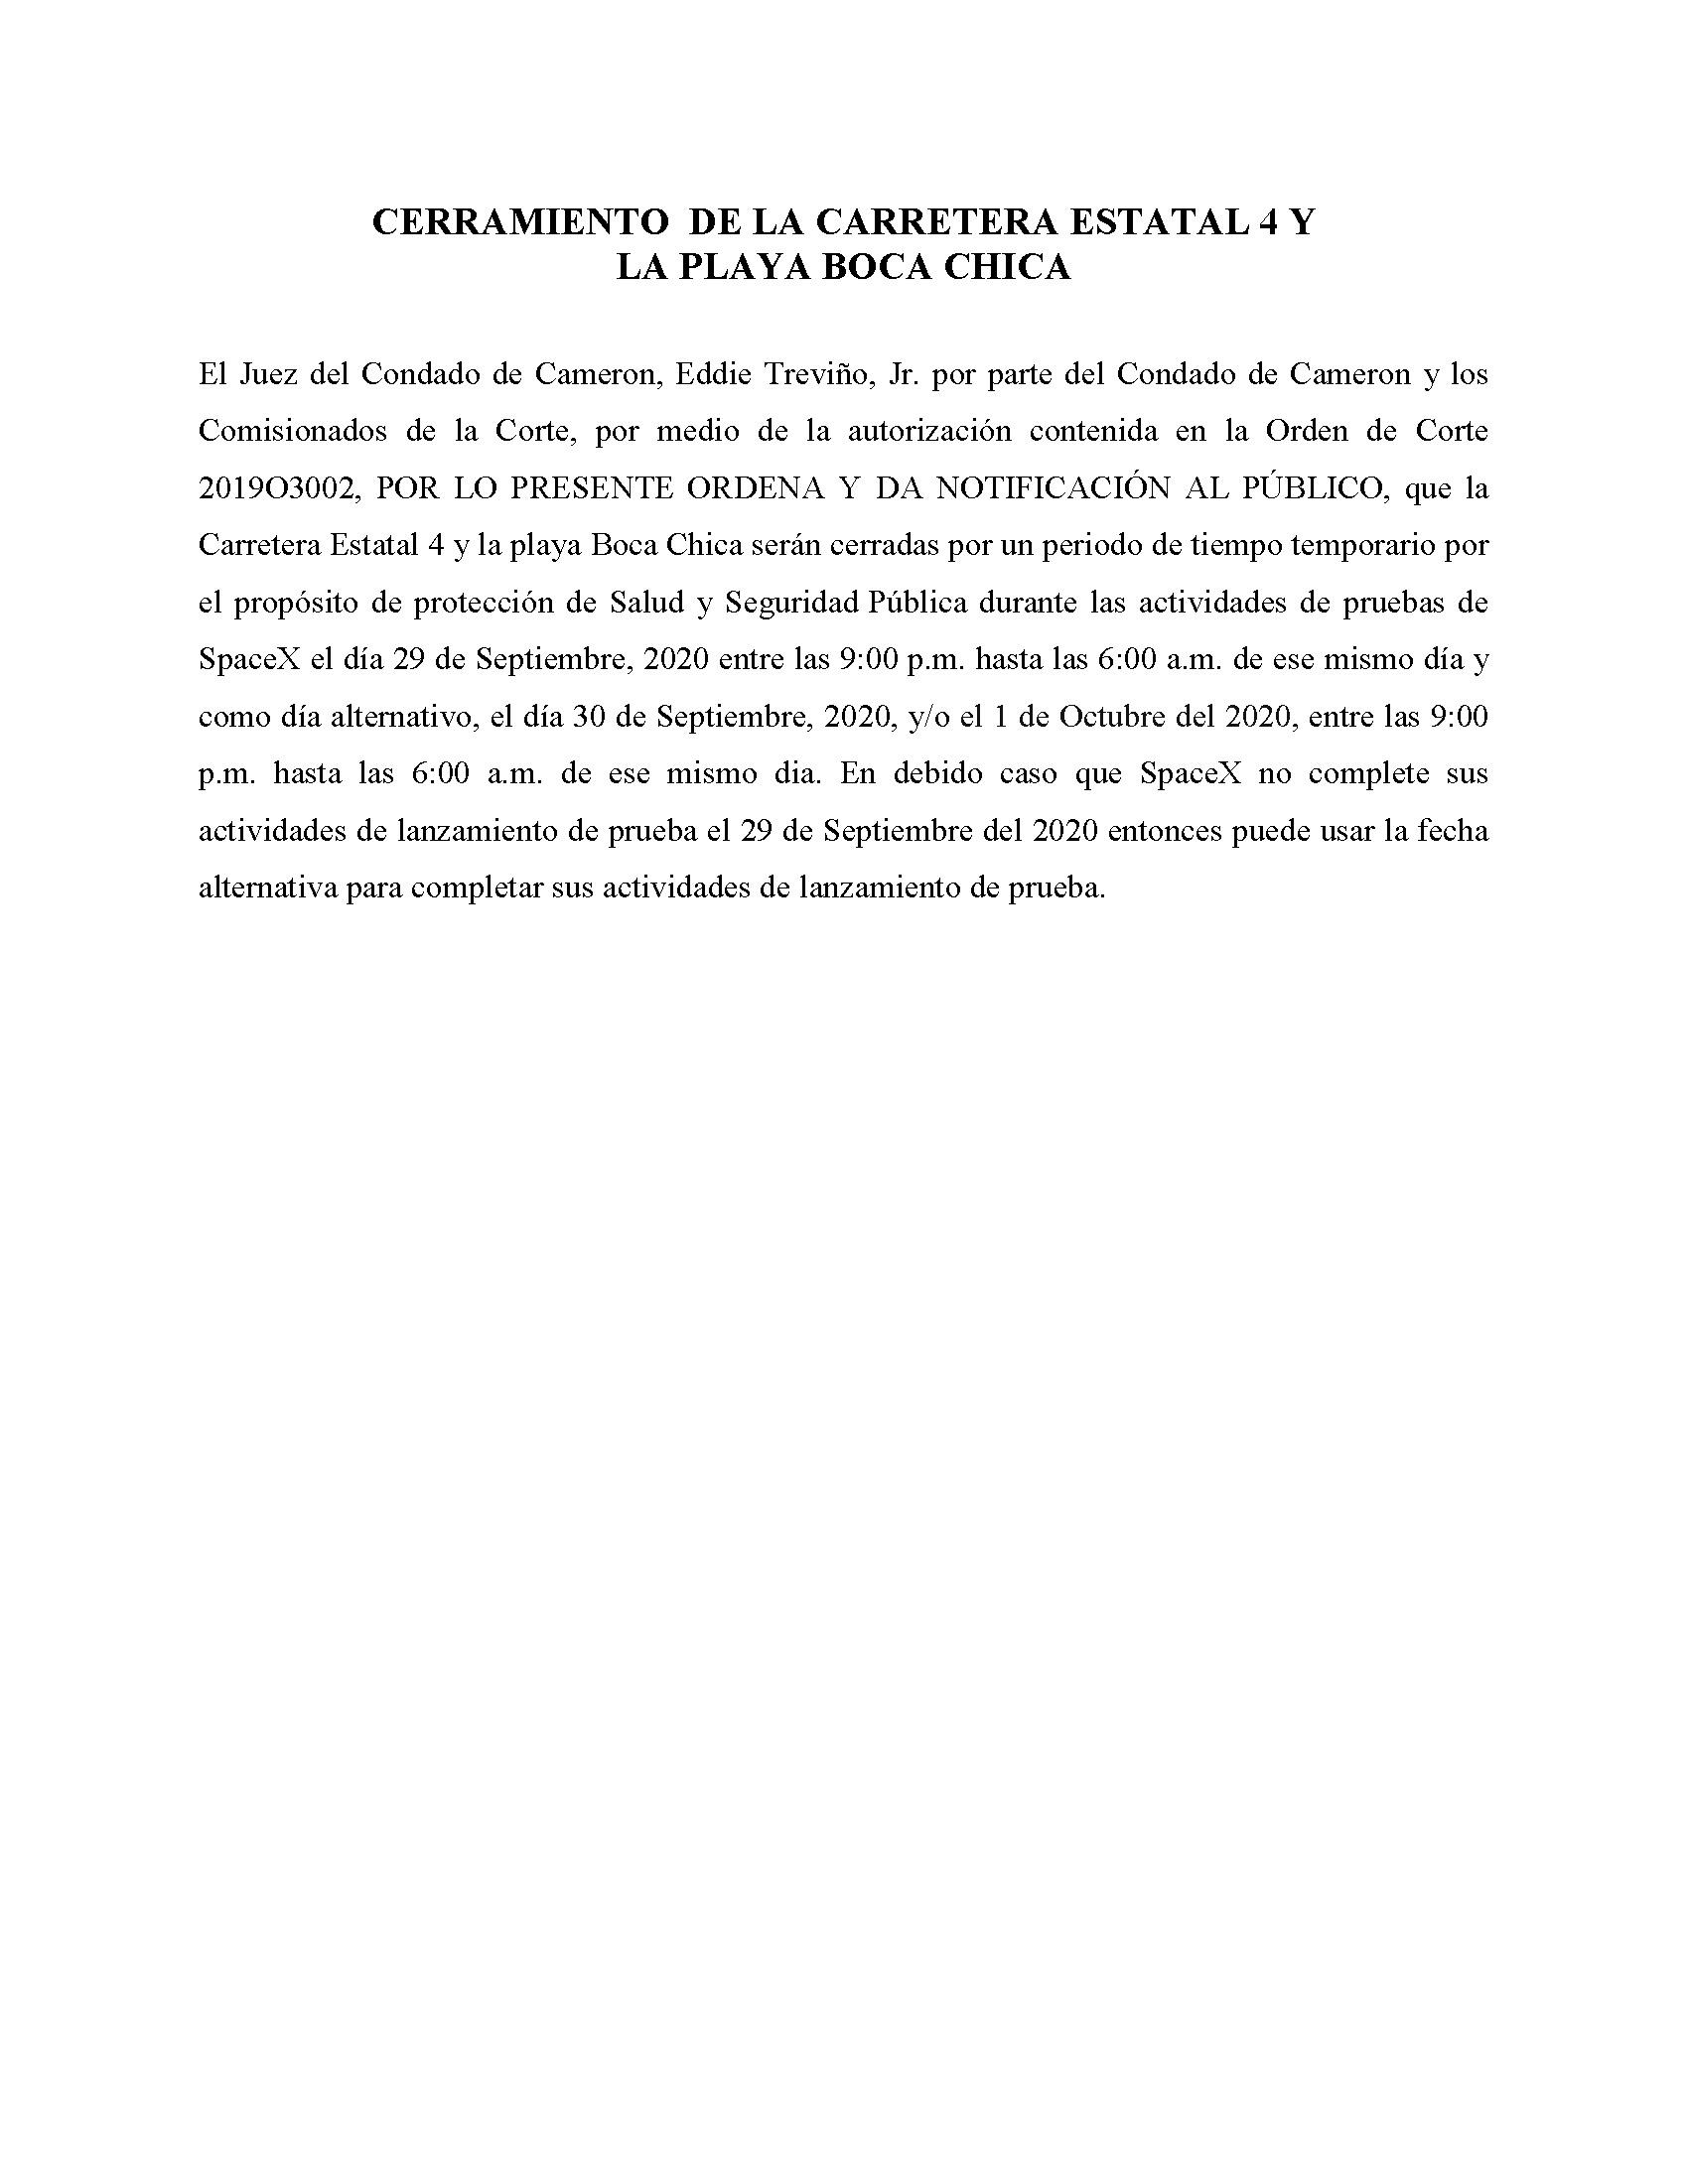 ORDER.CLOSURE OF HIGHWAY 4 Y LA PLAYA BOCA CHICA.SPANISH.09.29.20